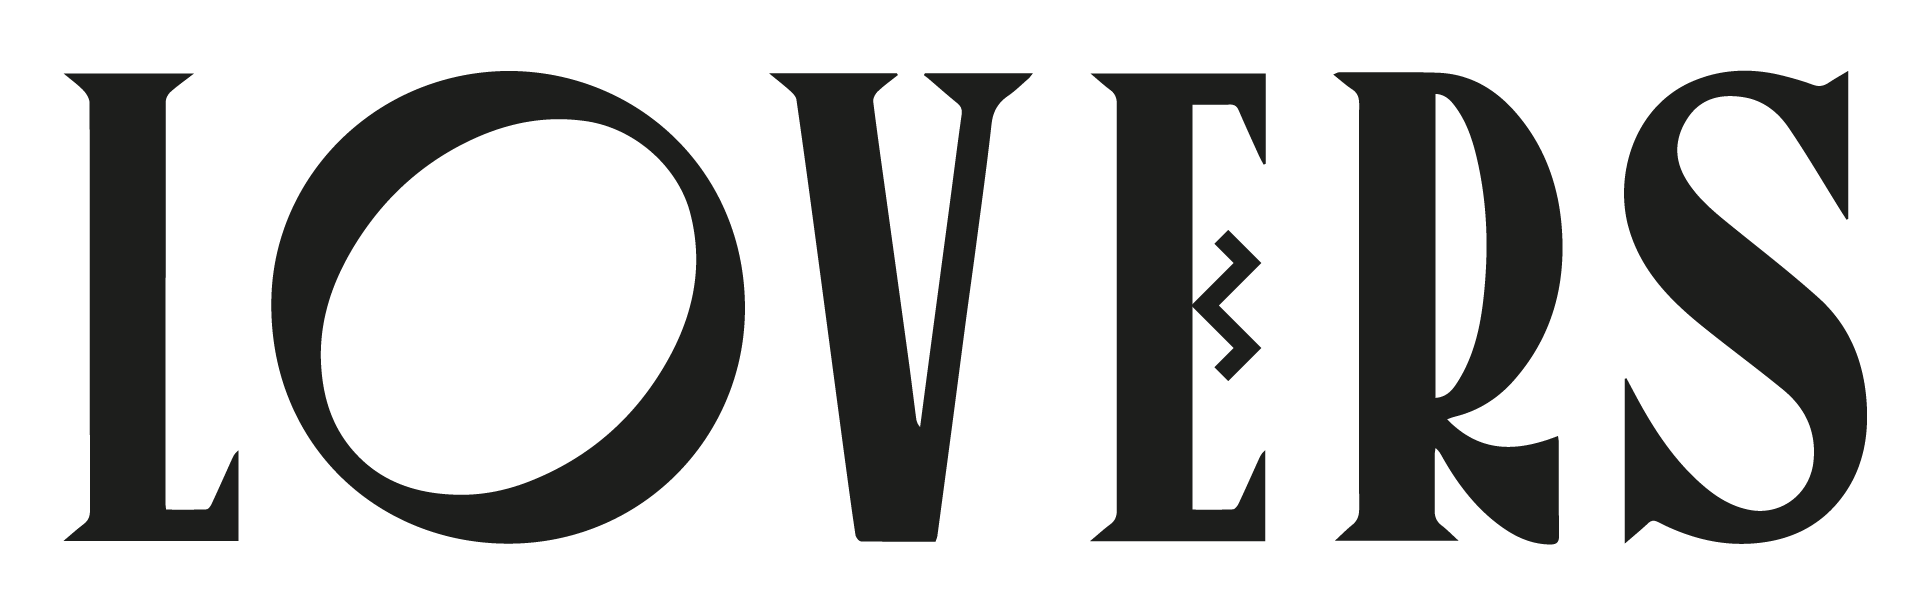 9916 Basement Lovers Logo ƒ 01.png